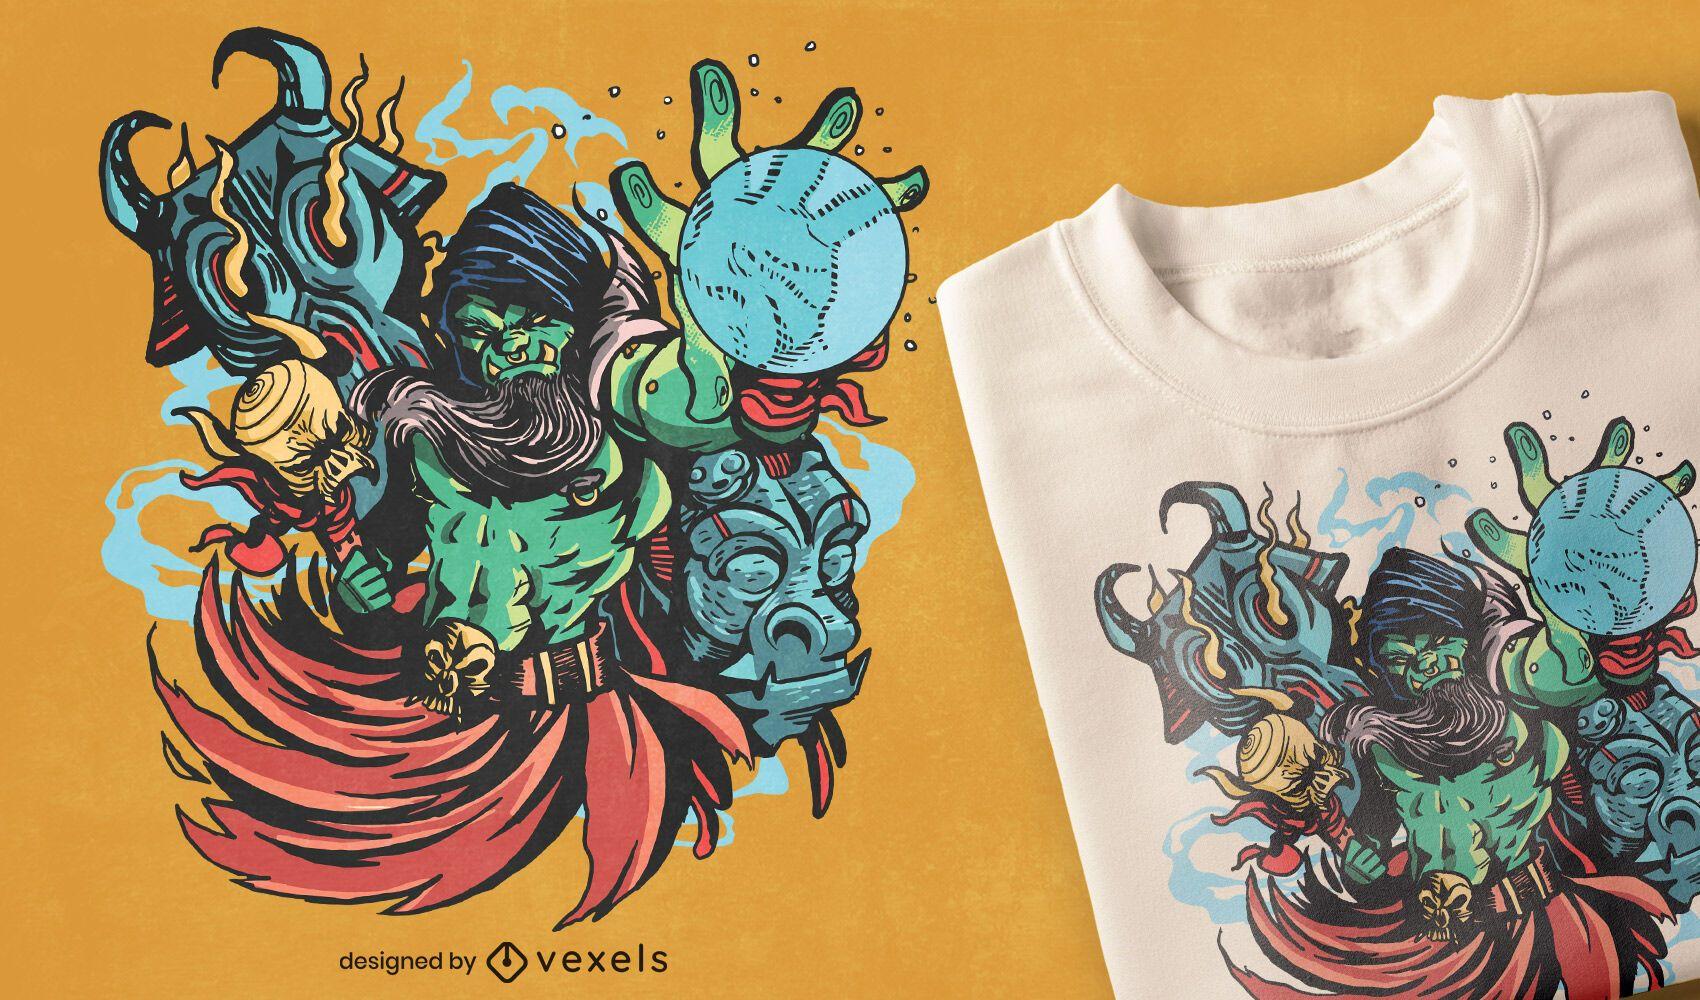 Orc chaman fantasy t-shirt design